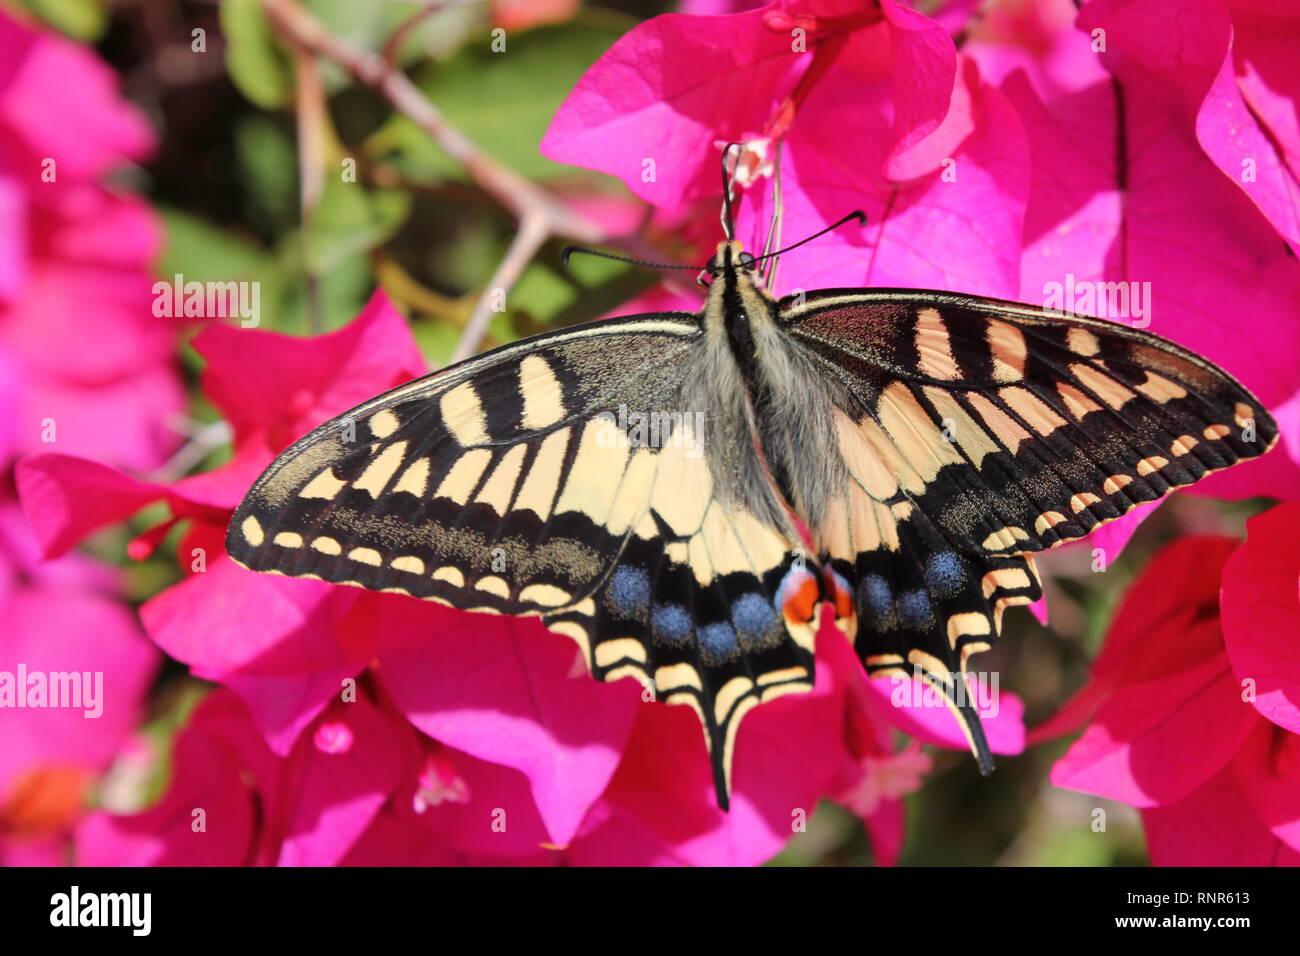 Swallowtail Butterfly (Papilio machaon), visiting the purple flowers of a Bougainvillea shrub near Mellieha, Malta - Stock Image